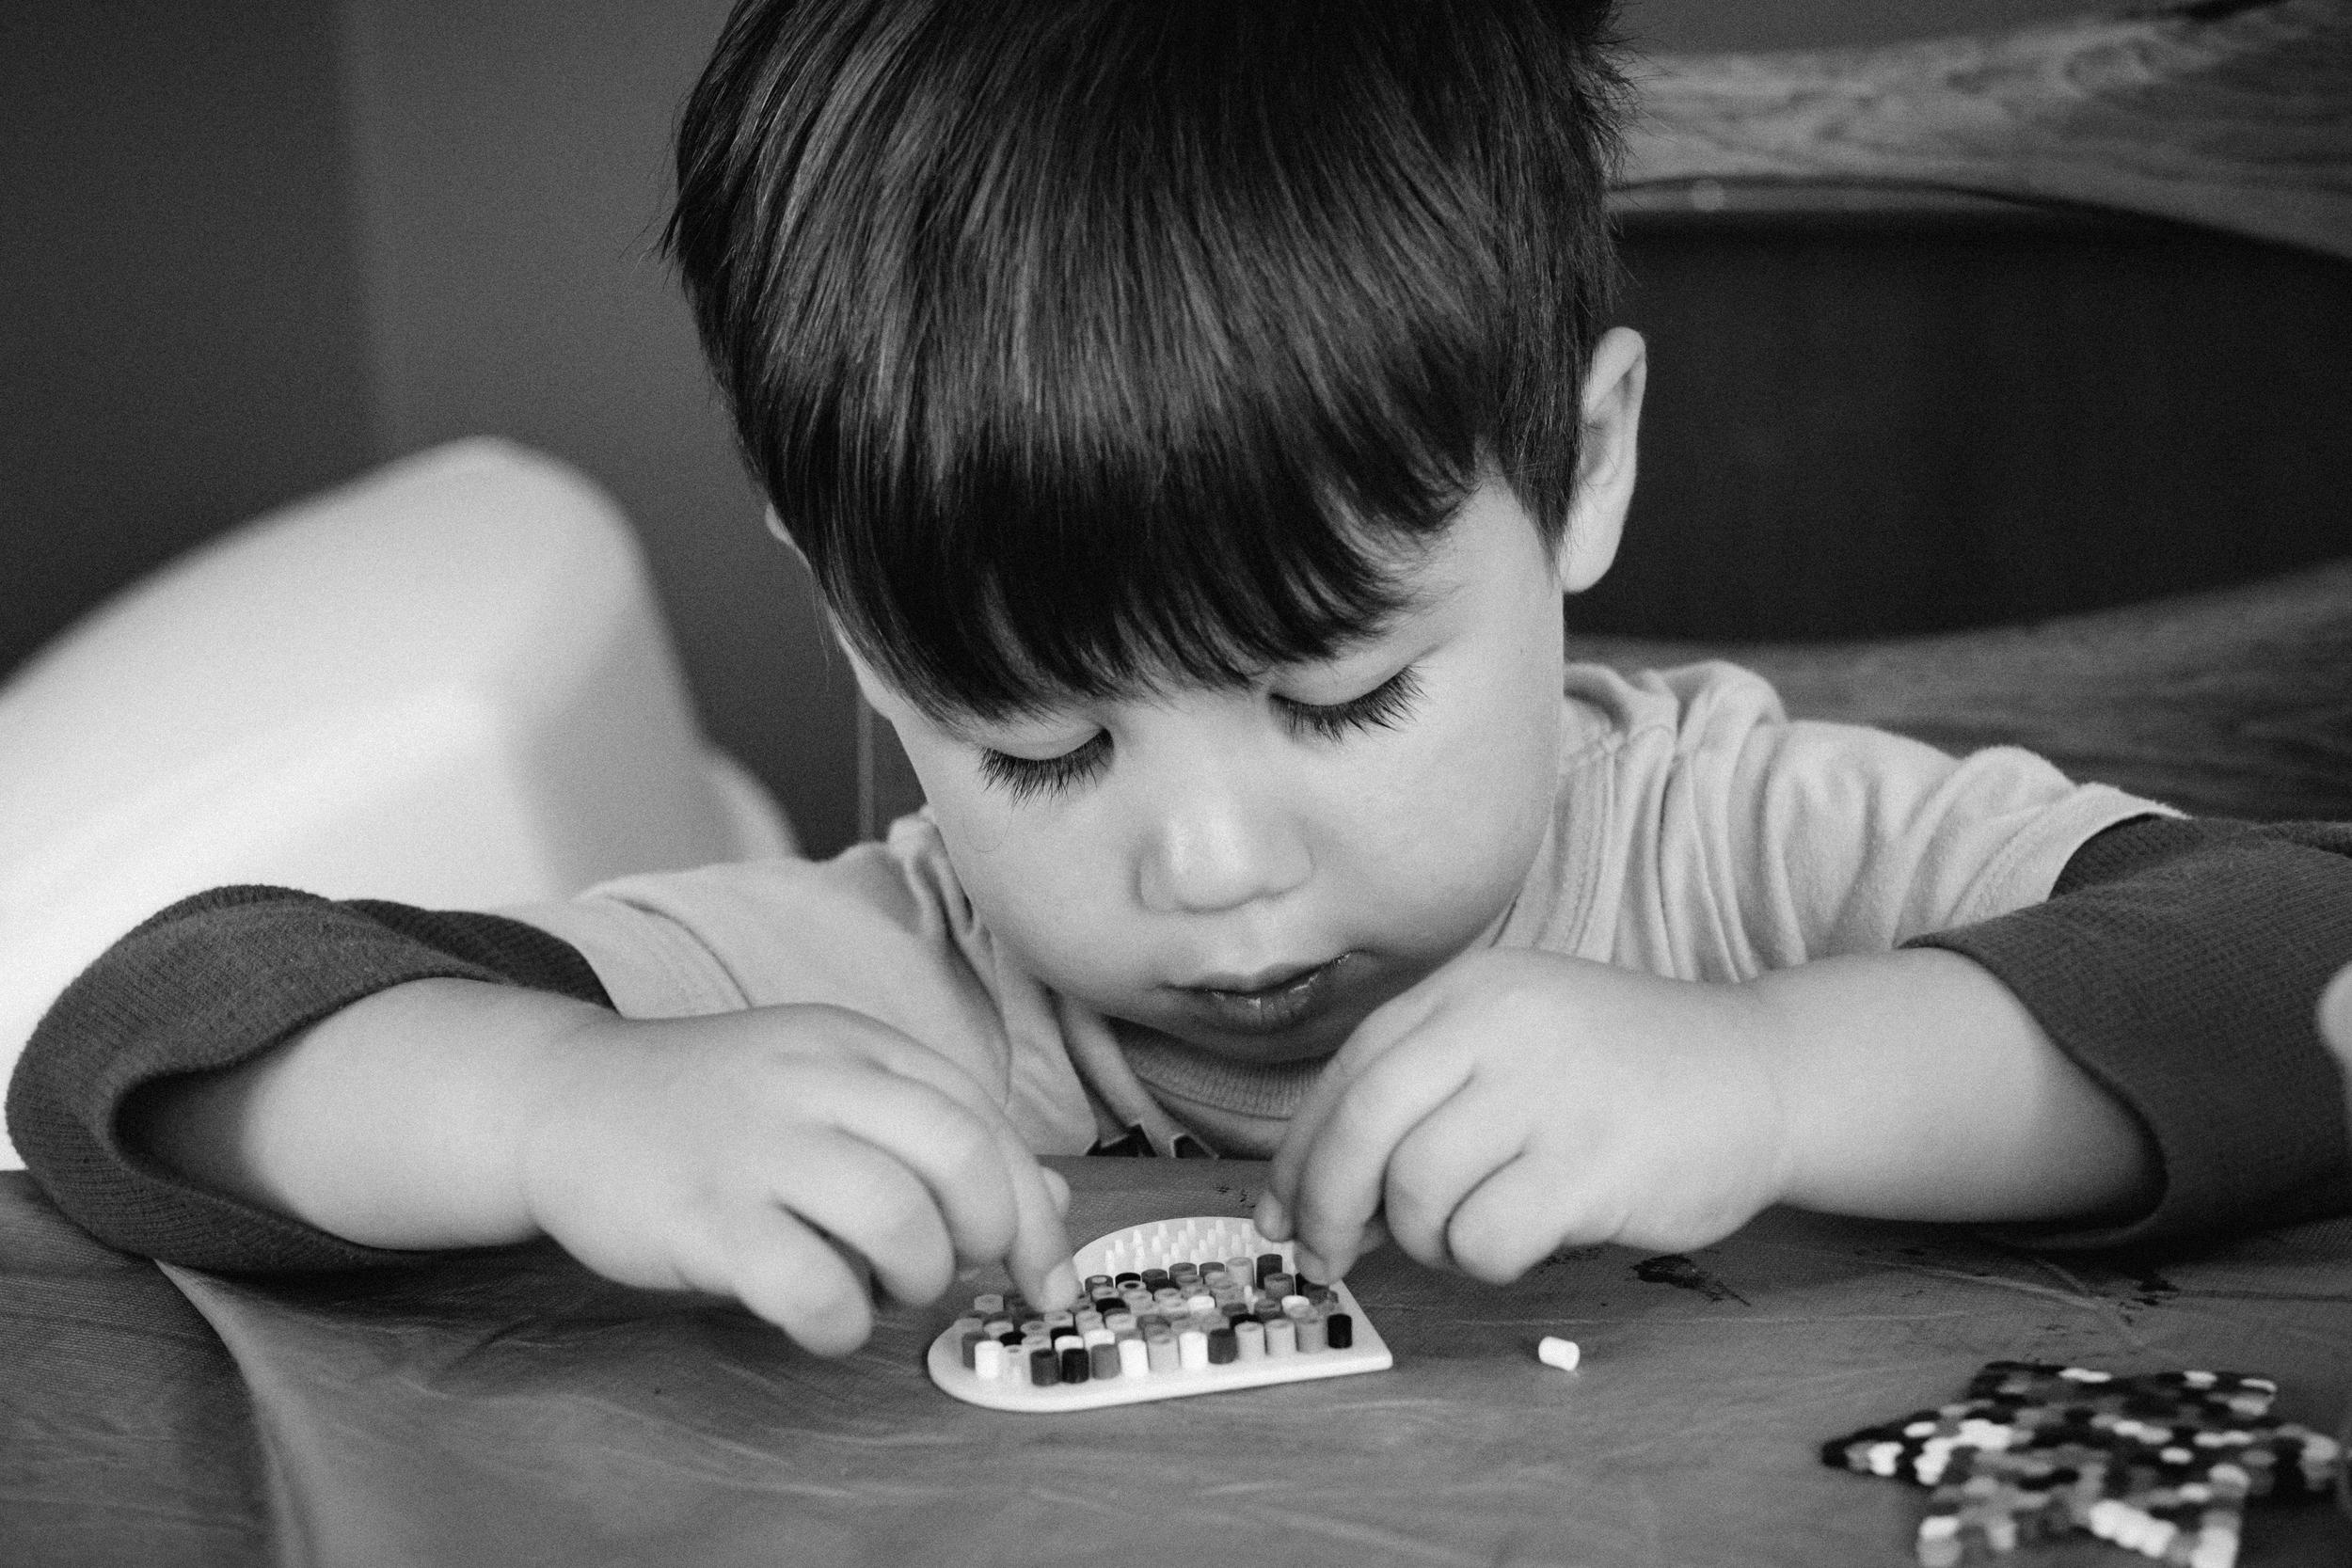 Focusing on his perler beads.